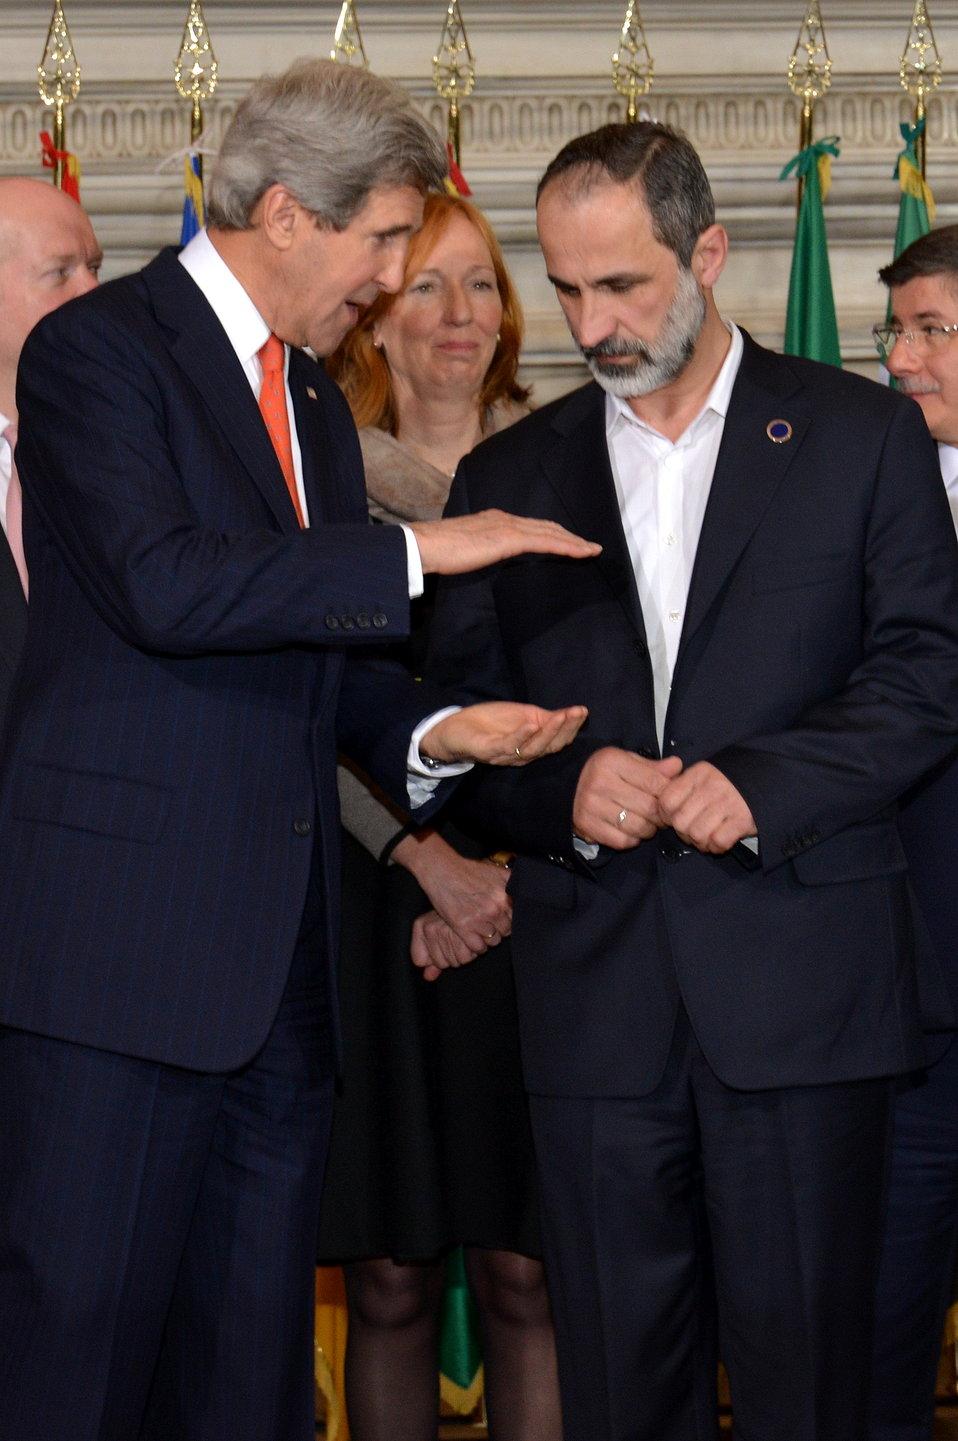 Secretary Kerry Speaks With Syrian Opposition Leader al-Khatib